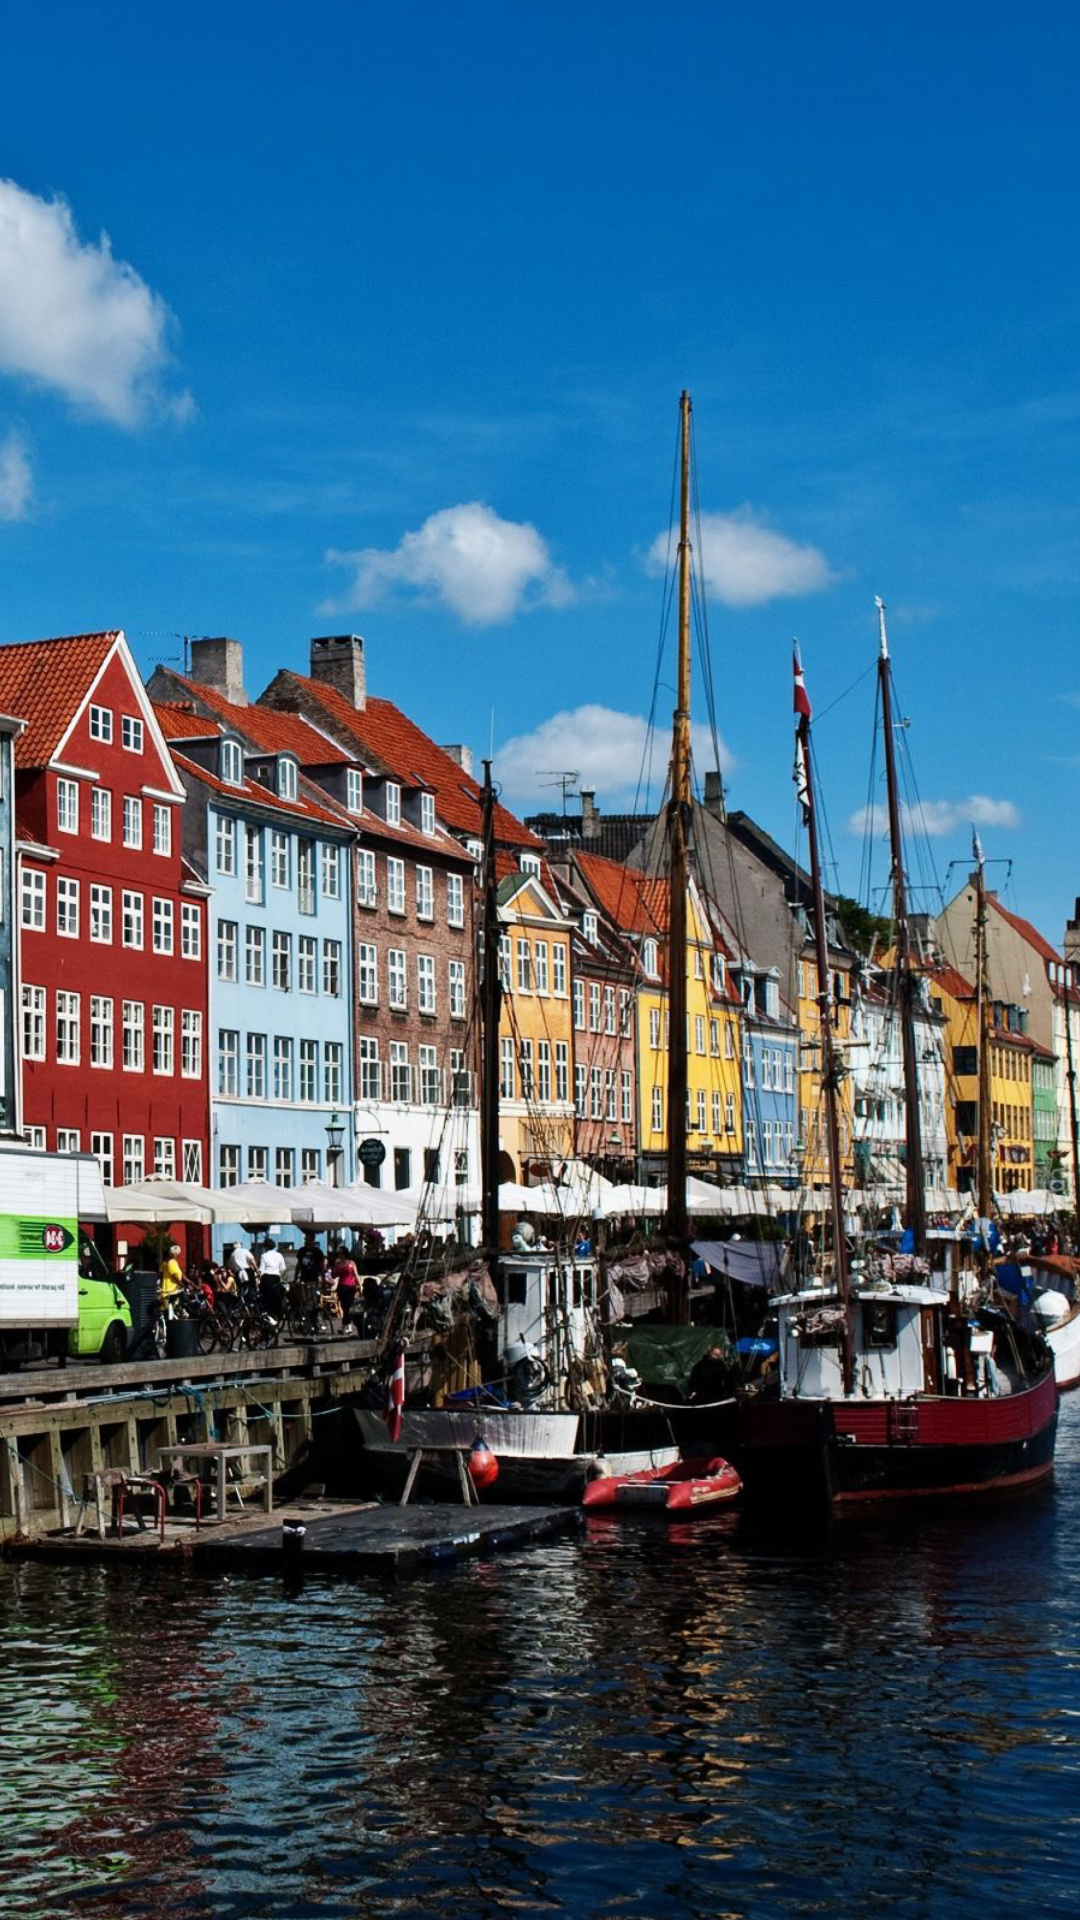 Copenhagen denmark wallpaper fondos de pantalla gratis para iphone 6 plus - Copenhagen wallpaper ...